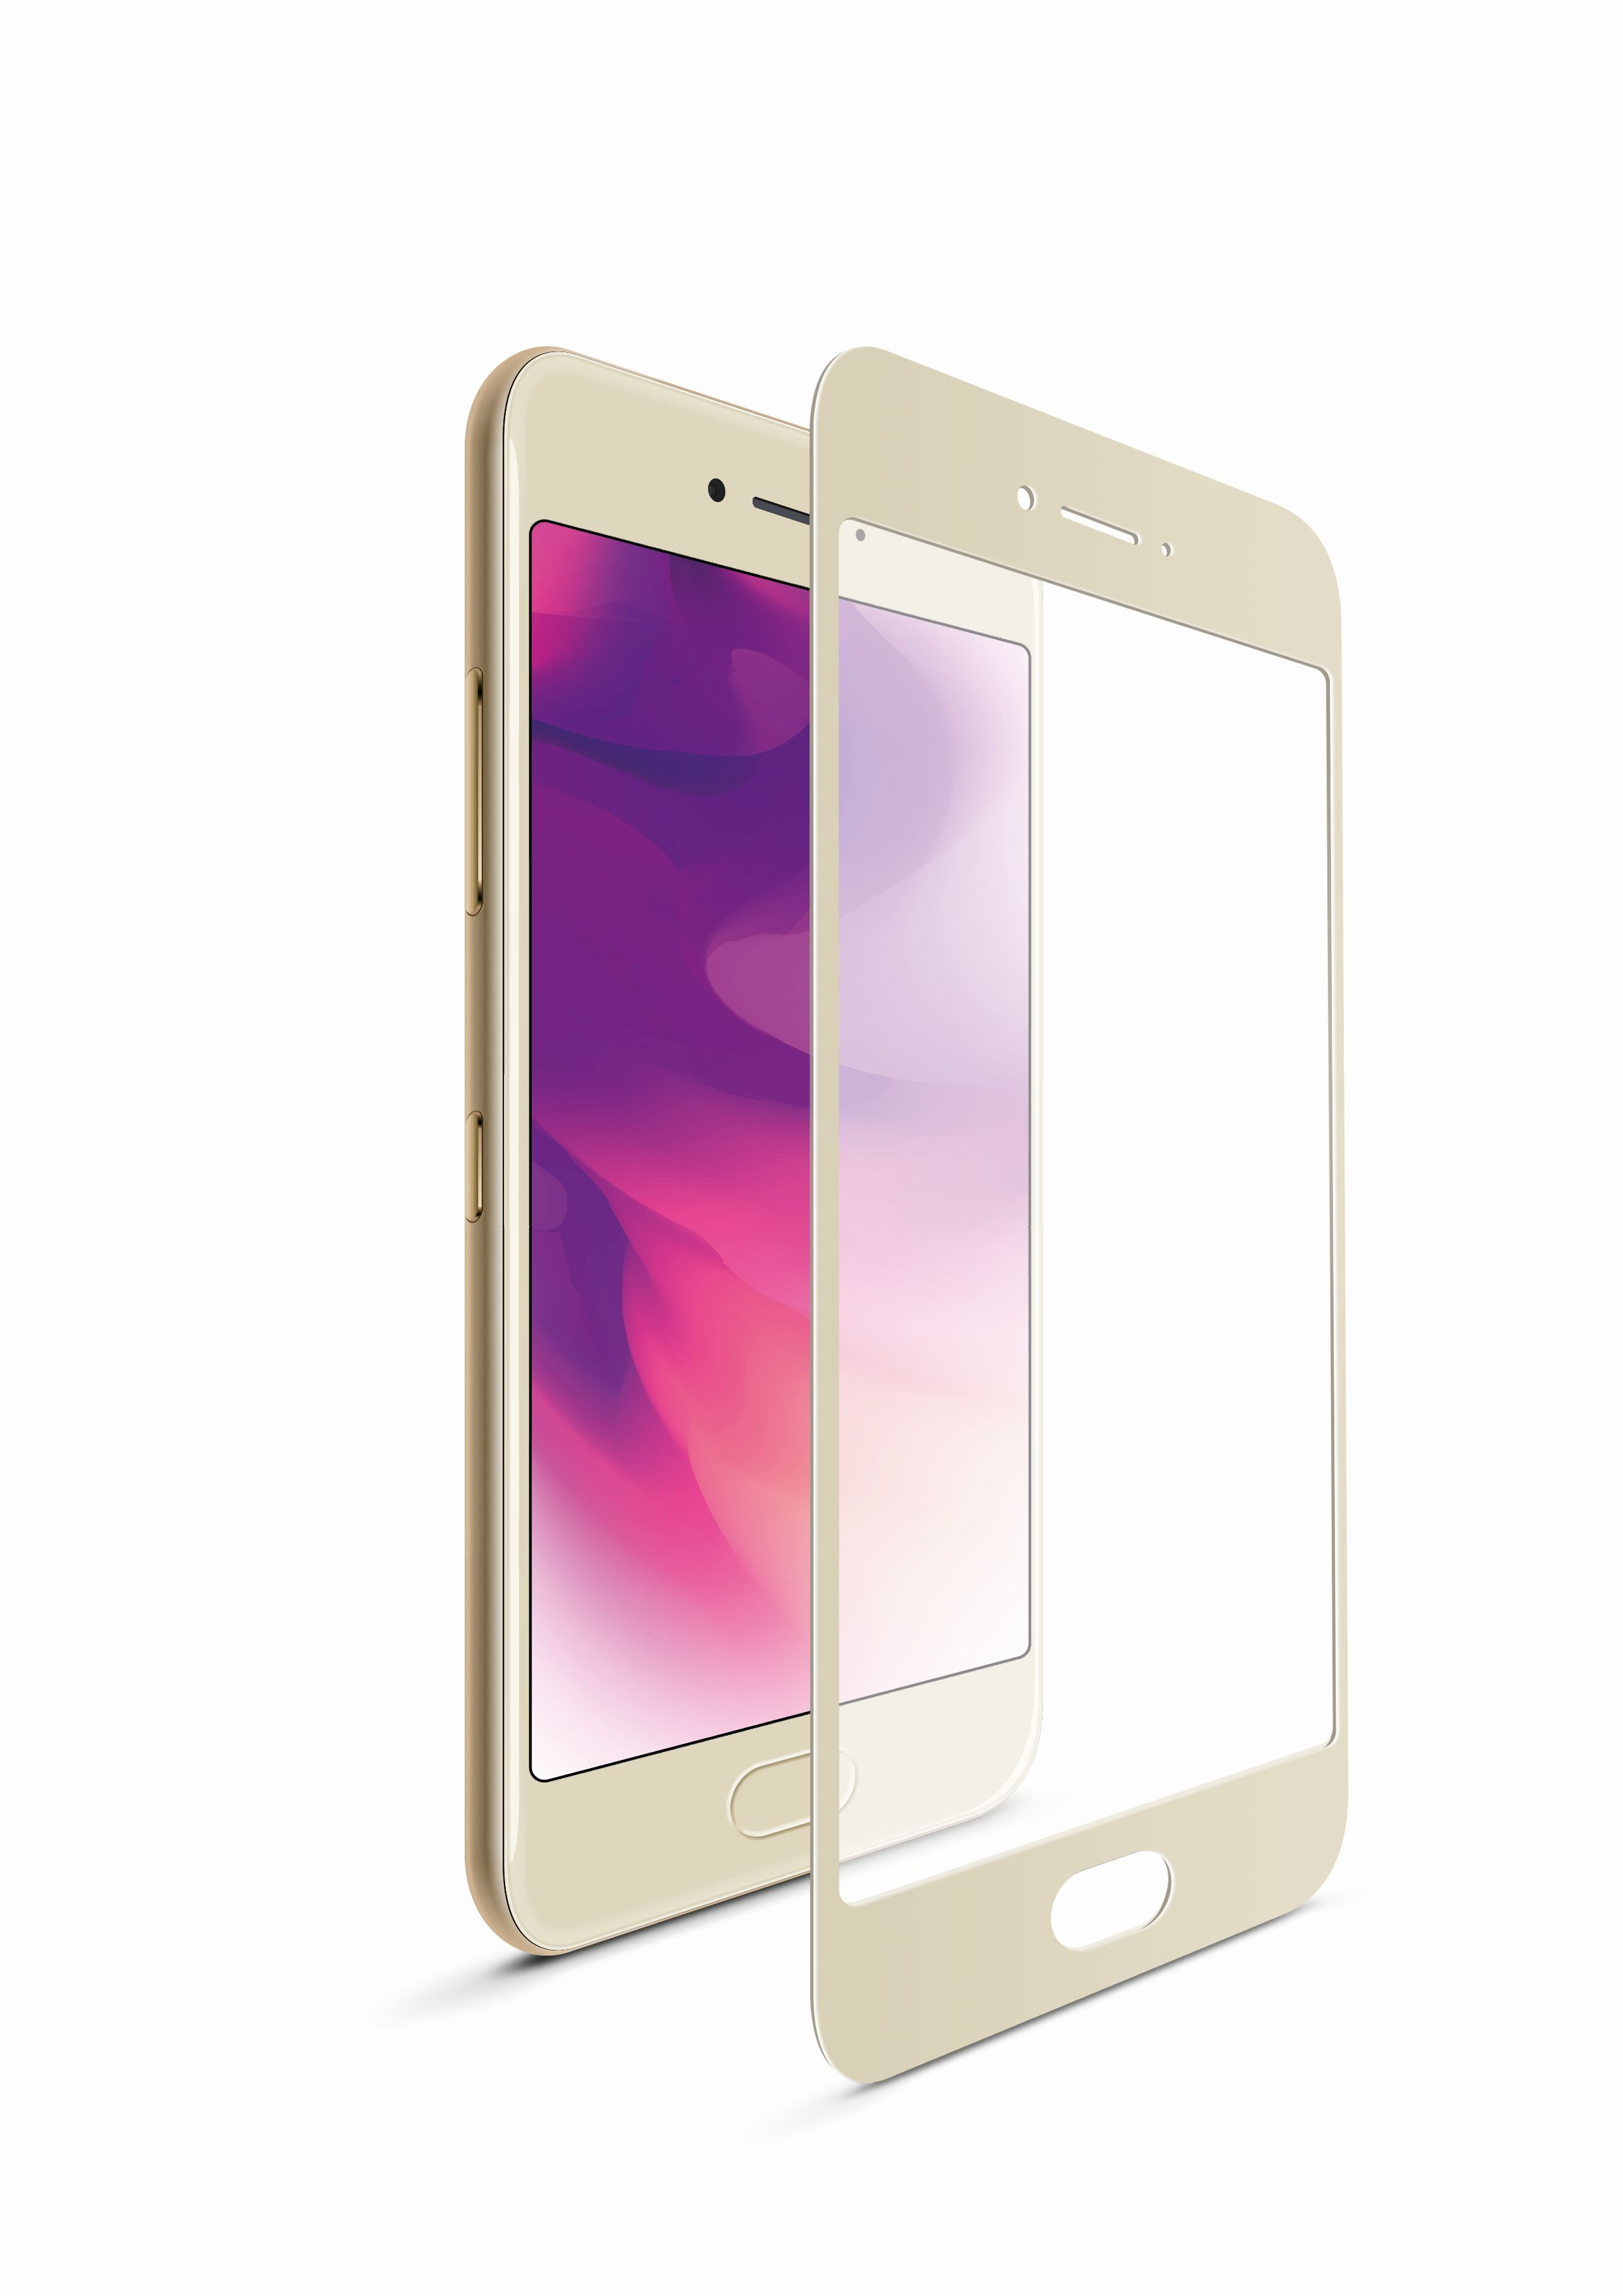 Ochranné tvrzené sklo FIXED Full-Cover pro Huawei Mate 10, přes celý displej, zlaté, 0.33 mm